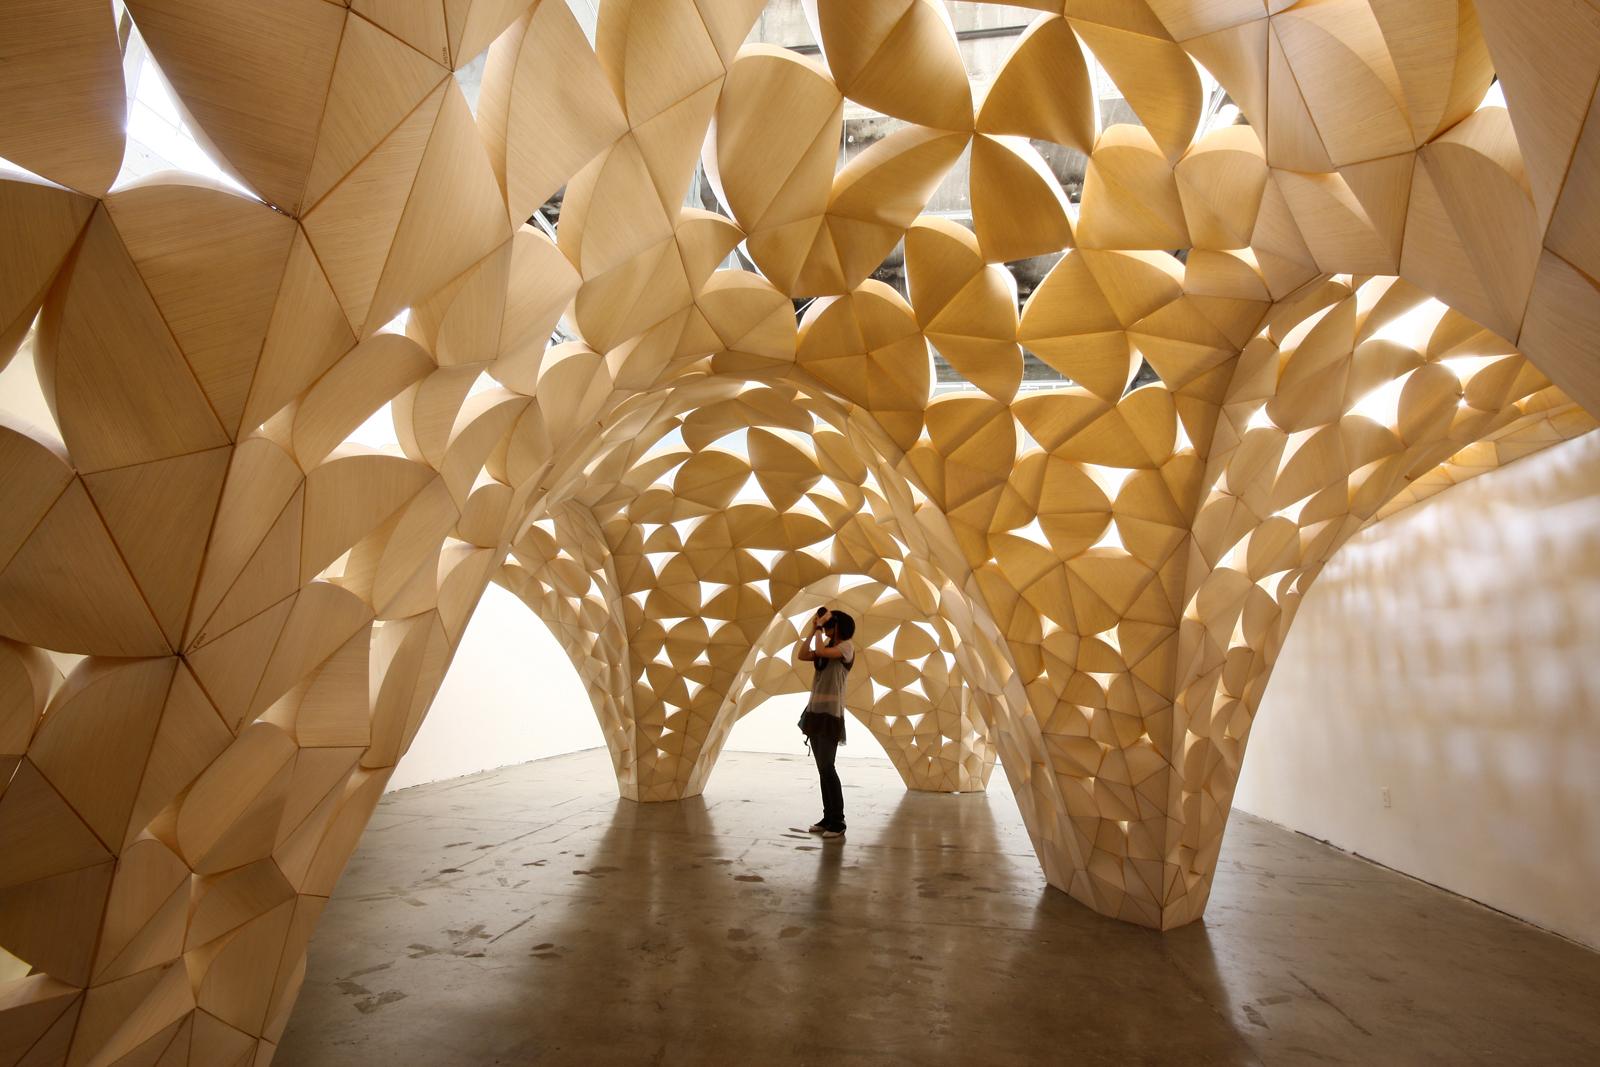 Voussoir Cloud installation by San Francisco firm IwamotoScott Architecture